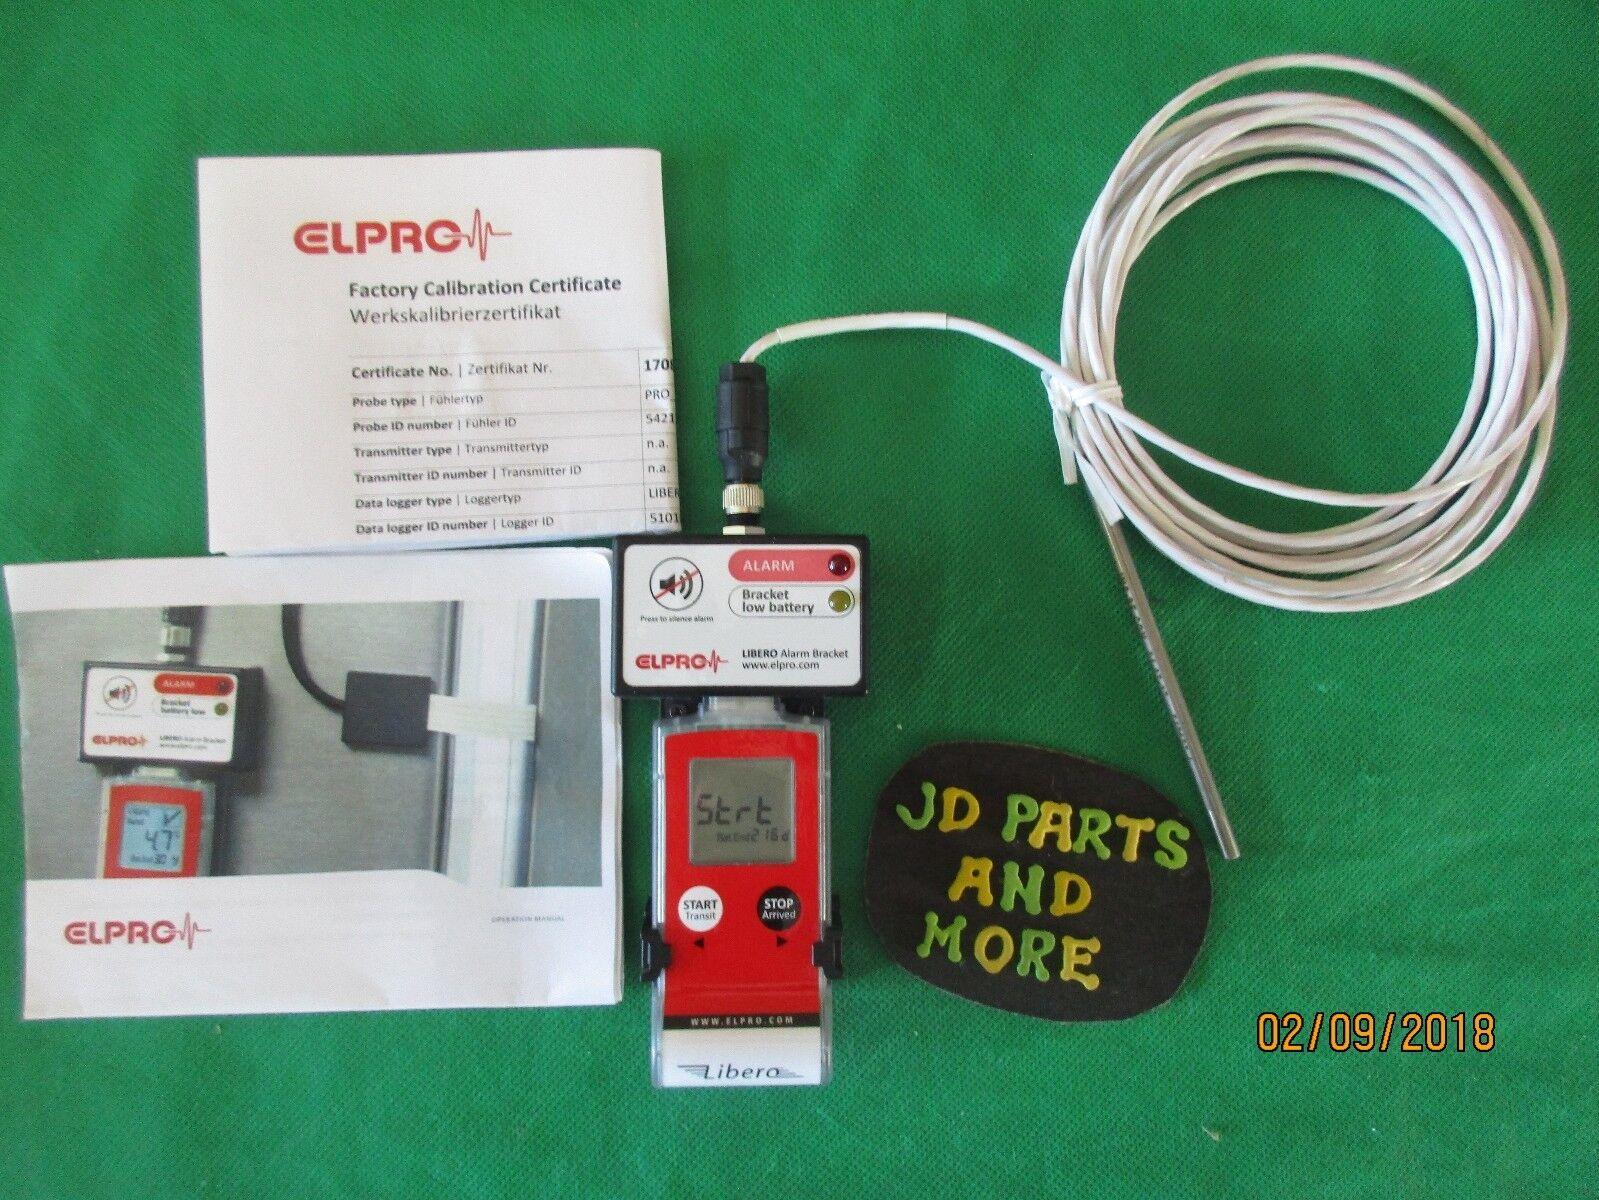 ELPRO LIBERO USB DRIVERS FOR WINDOWS MAC